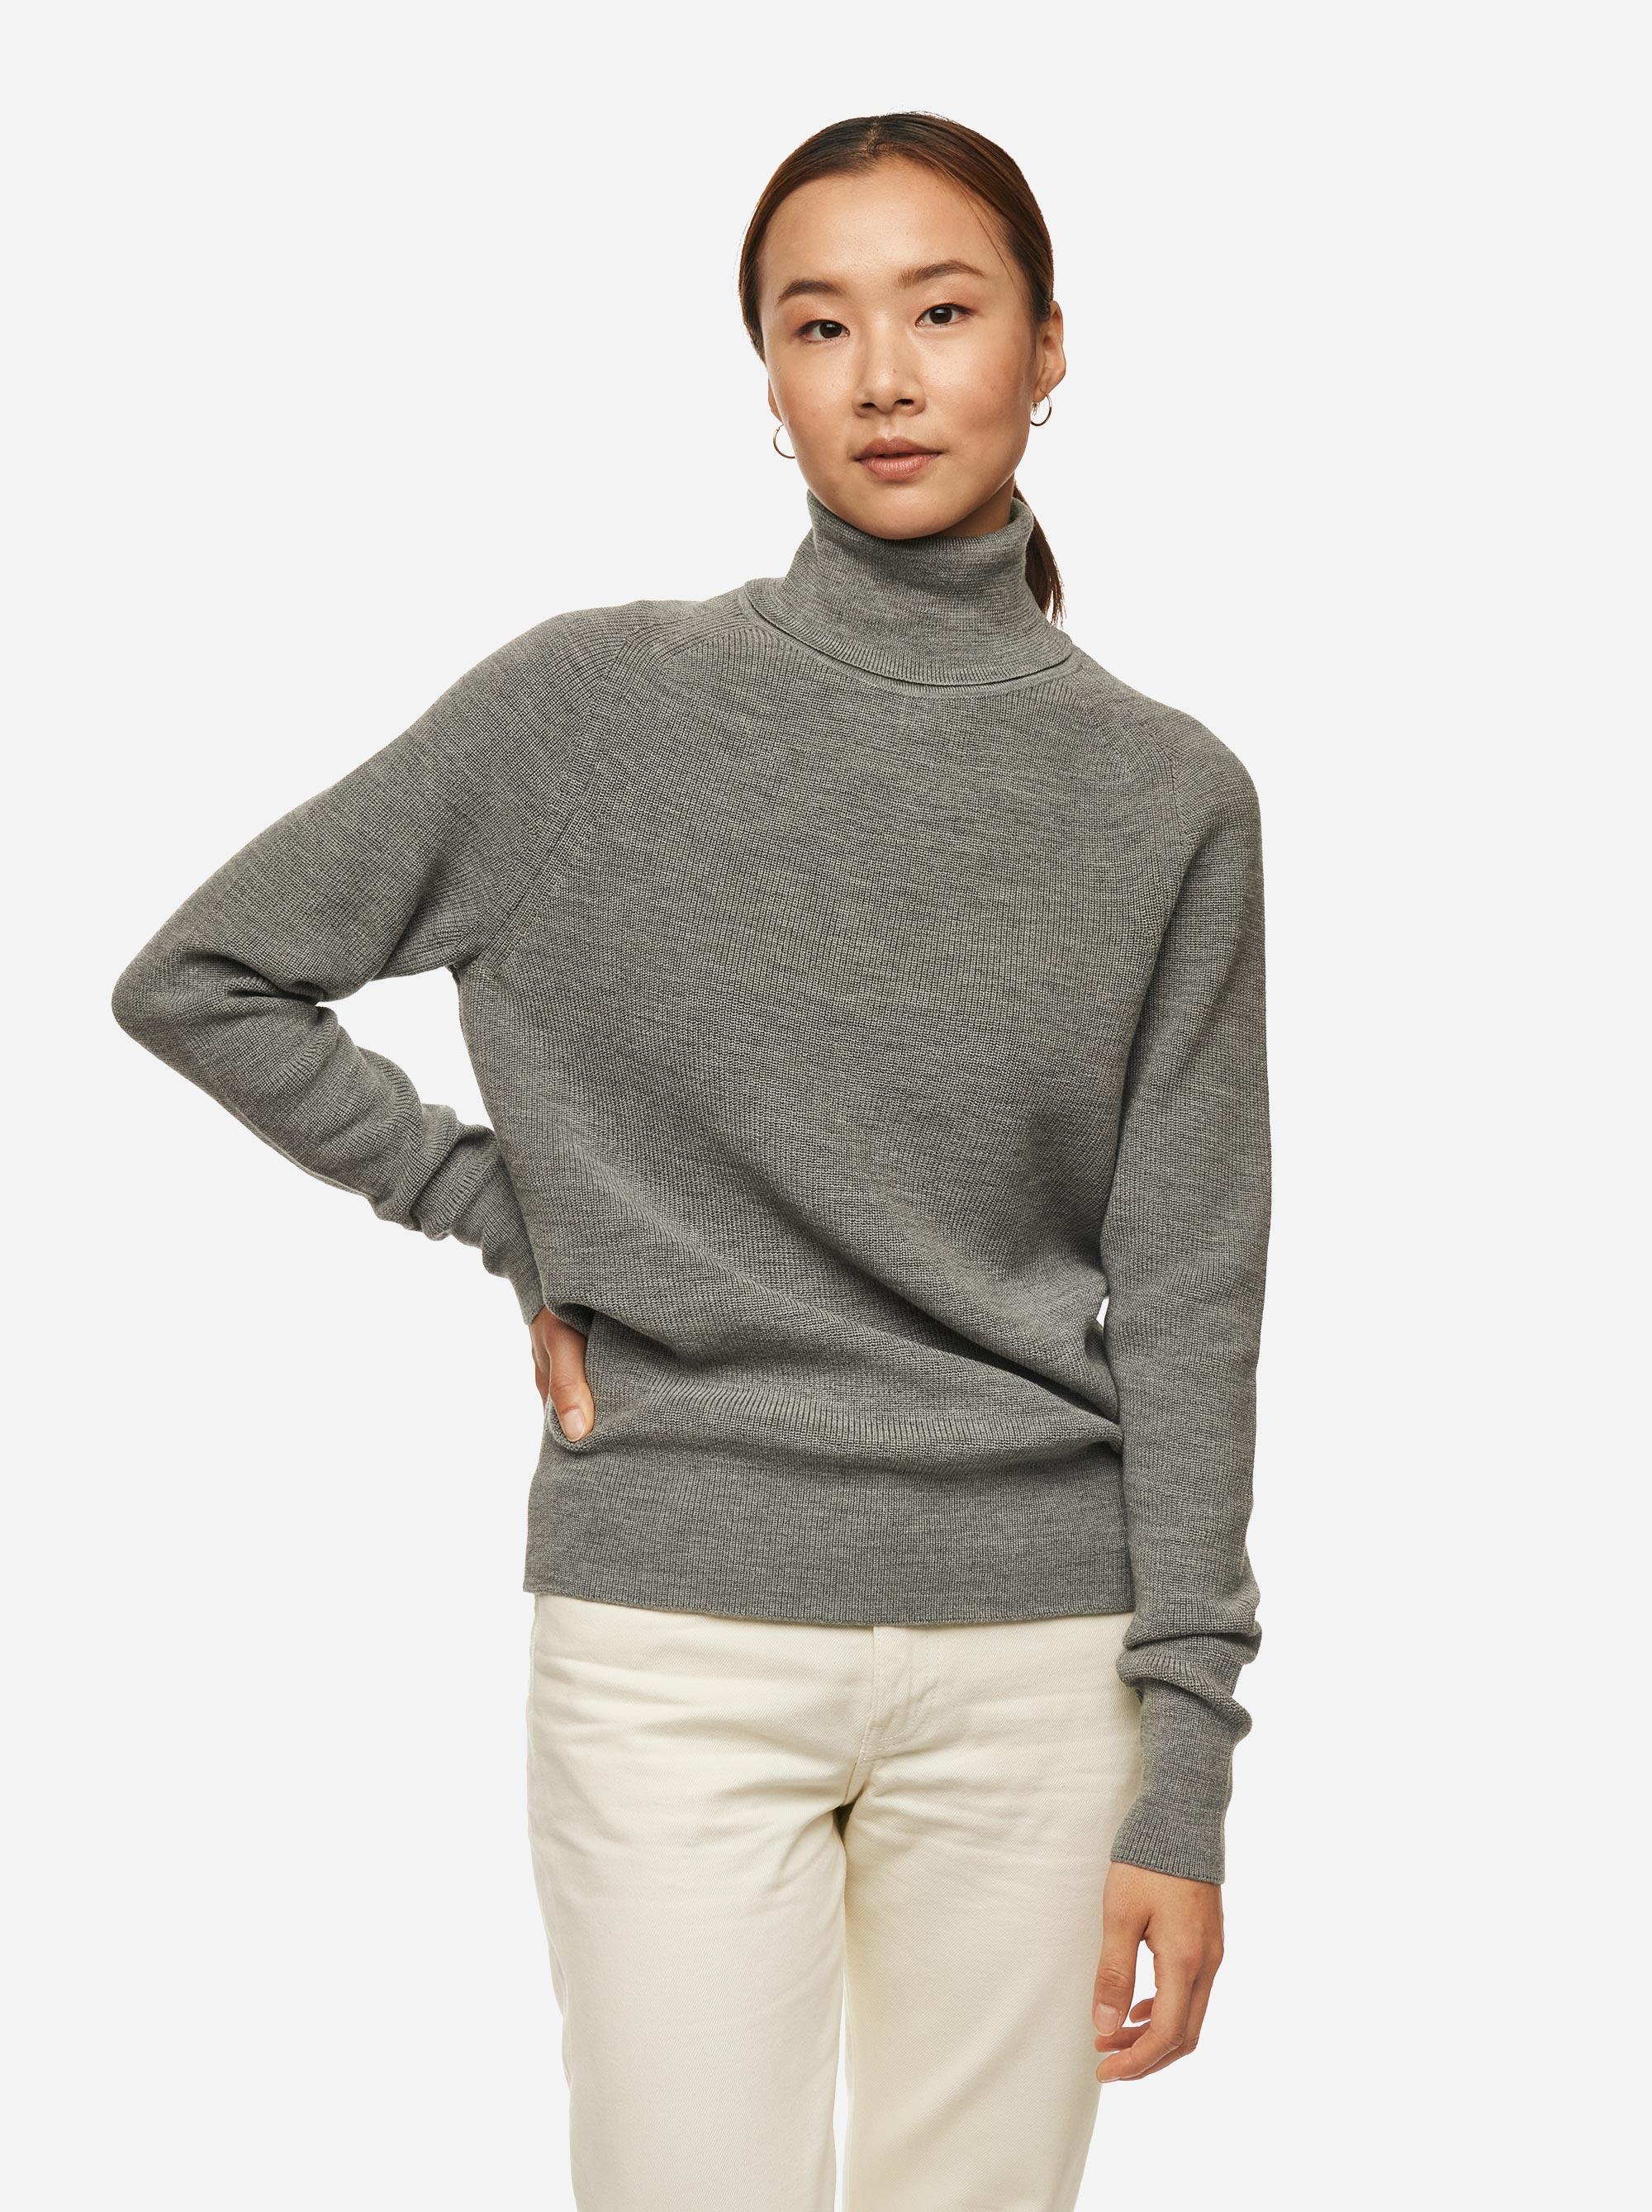 Teym - Turtleneck - The Merino Sweater - Women - Grey - 1